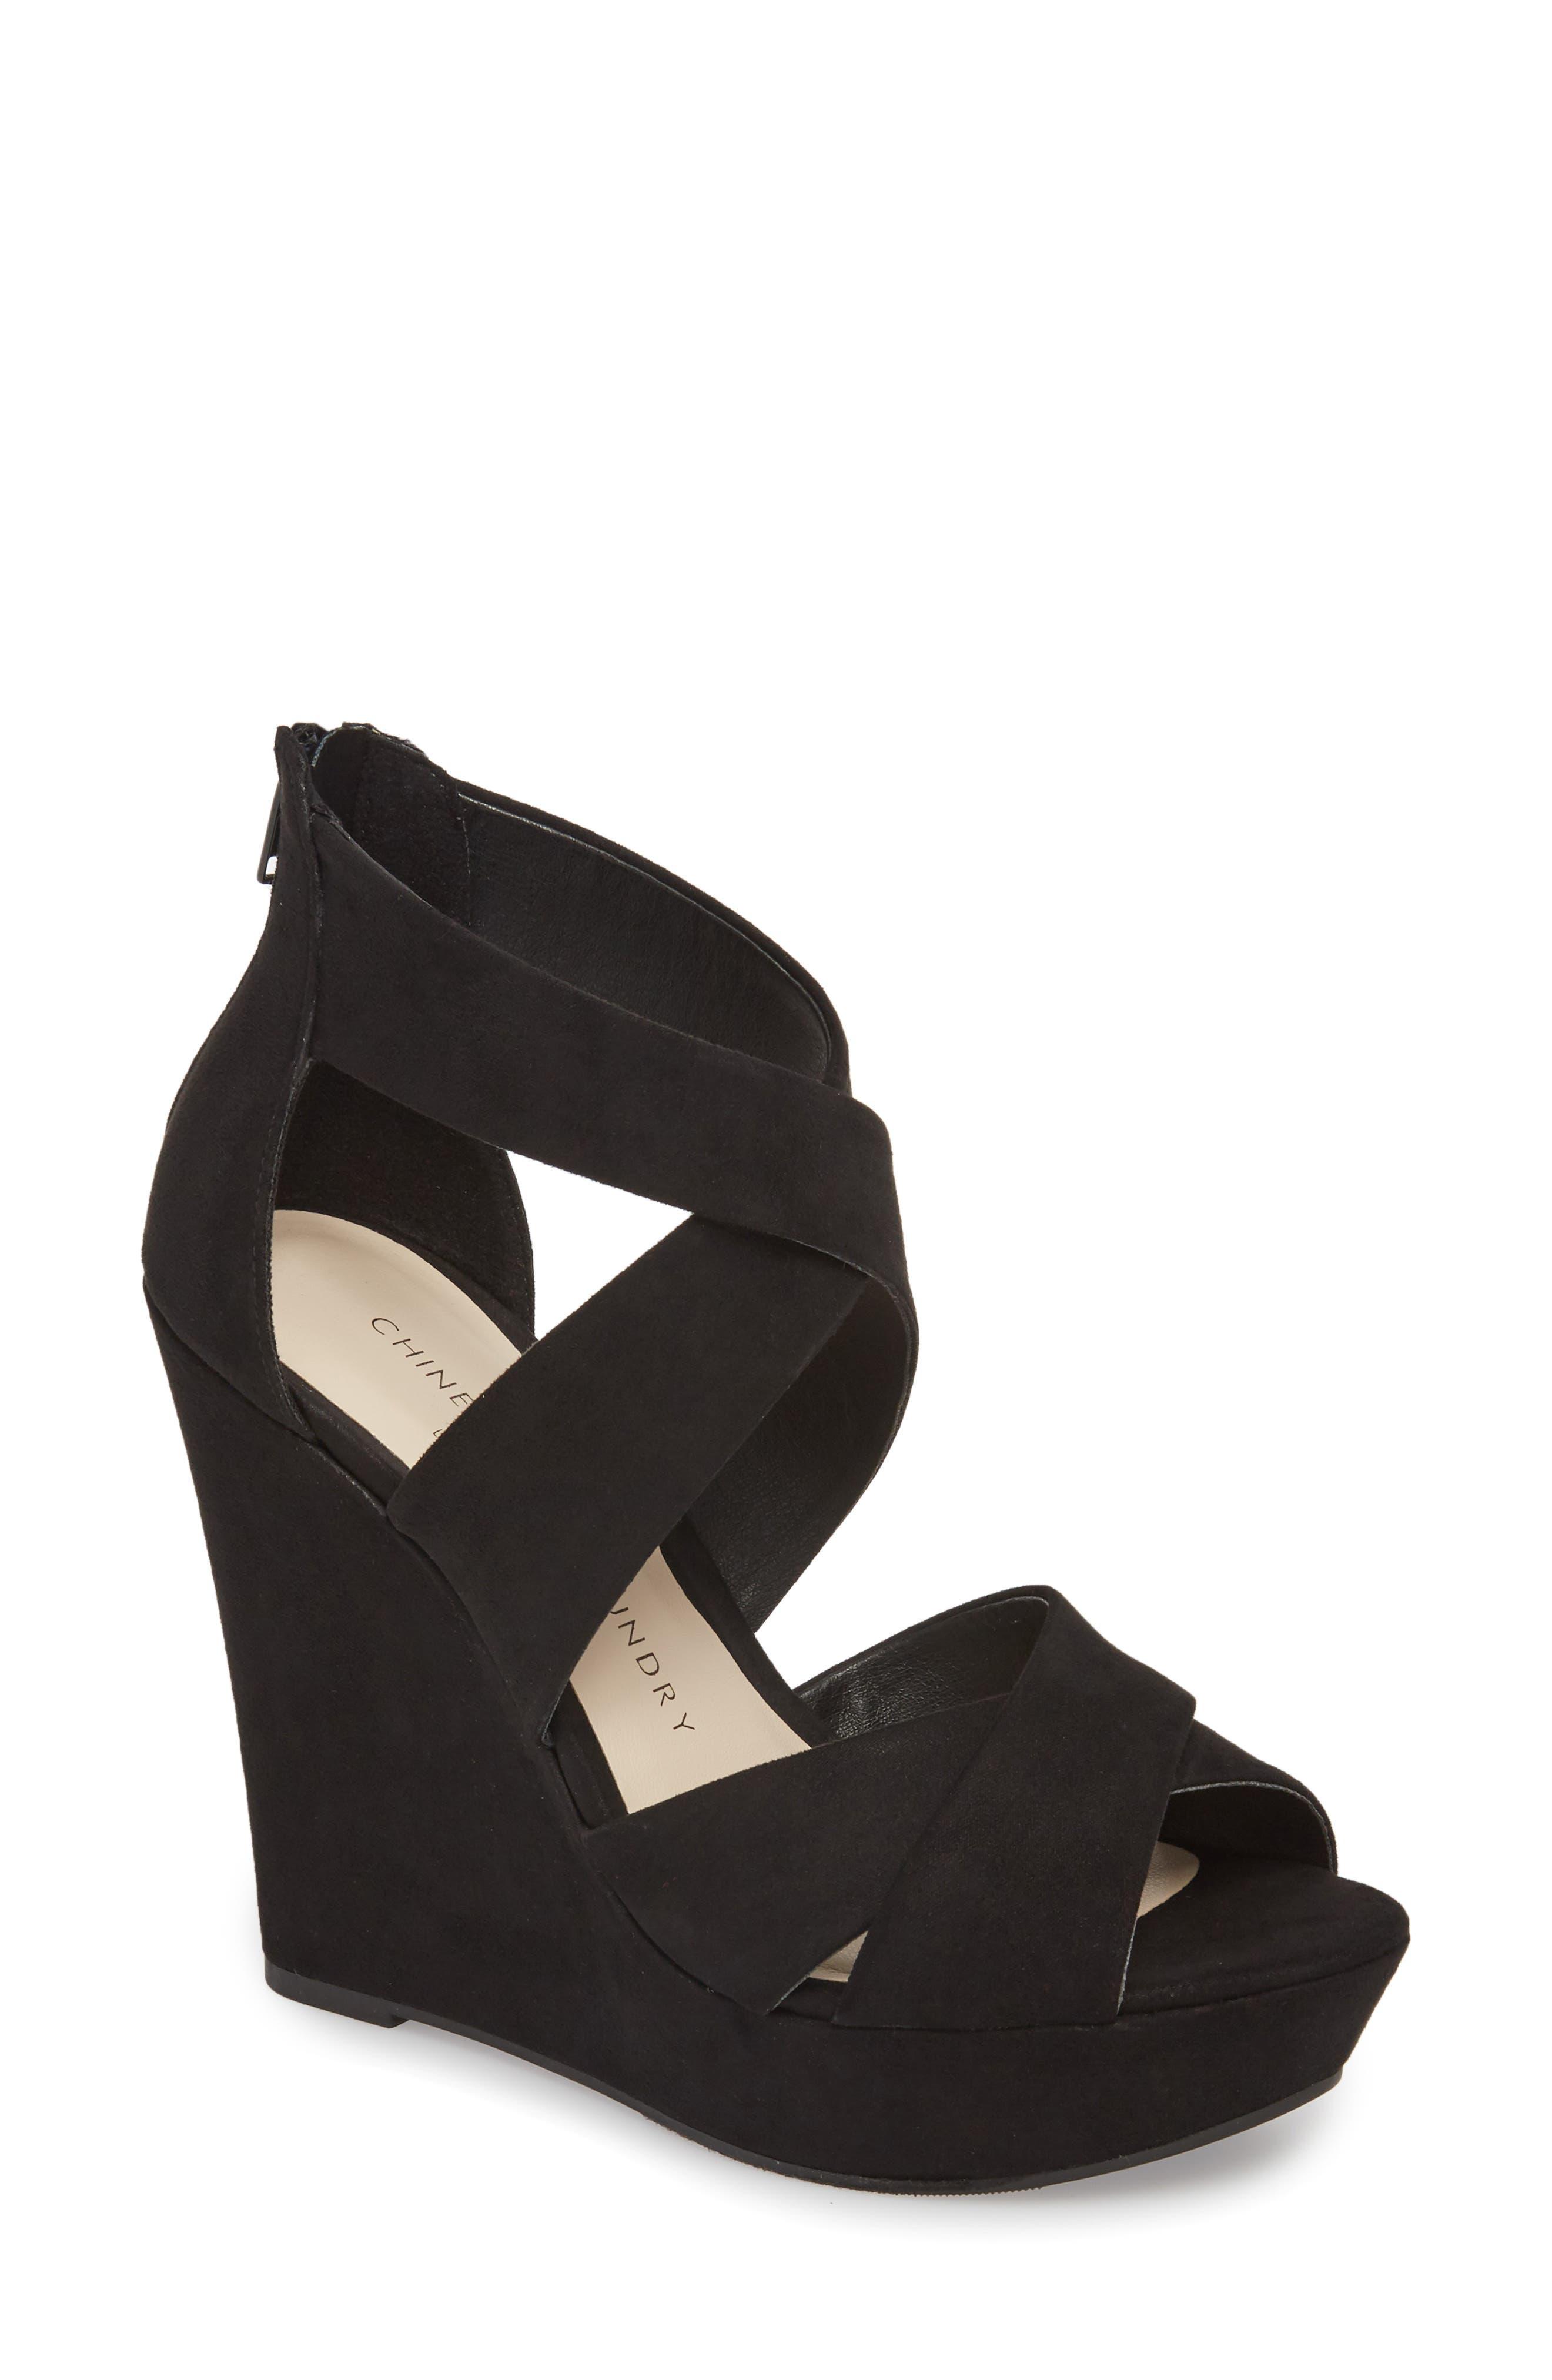 Milani Platform Wedge Sandal,                         Main,                         color, 005